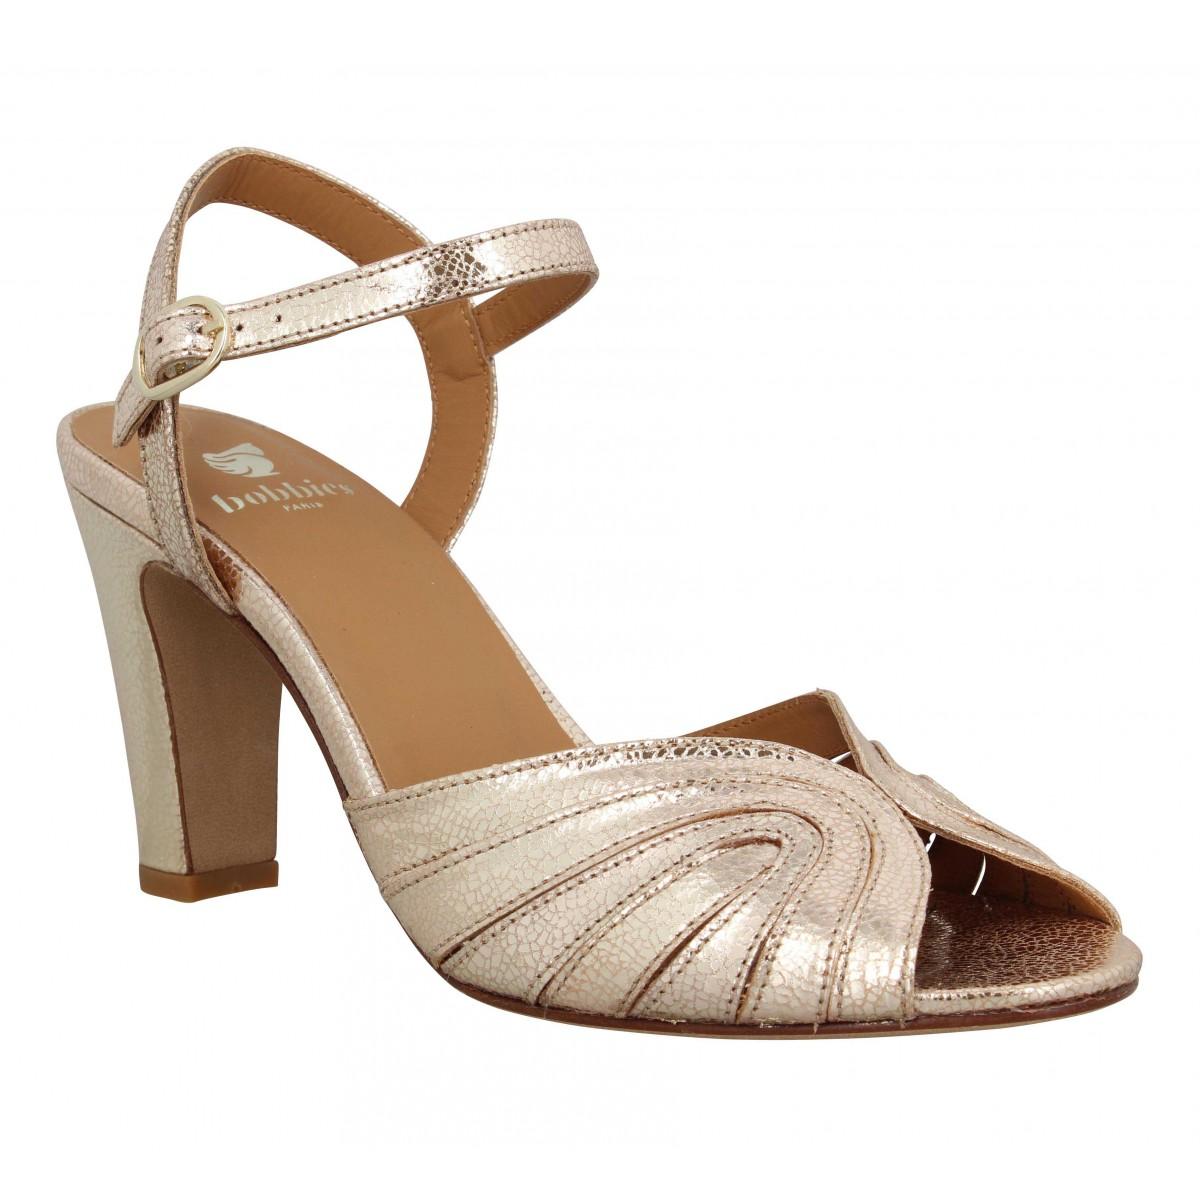 Sandales talons BOBBIES Ella cuir craquele Femme Dore